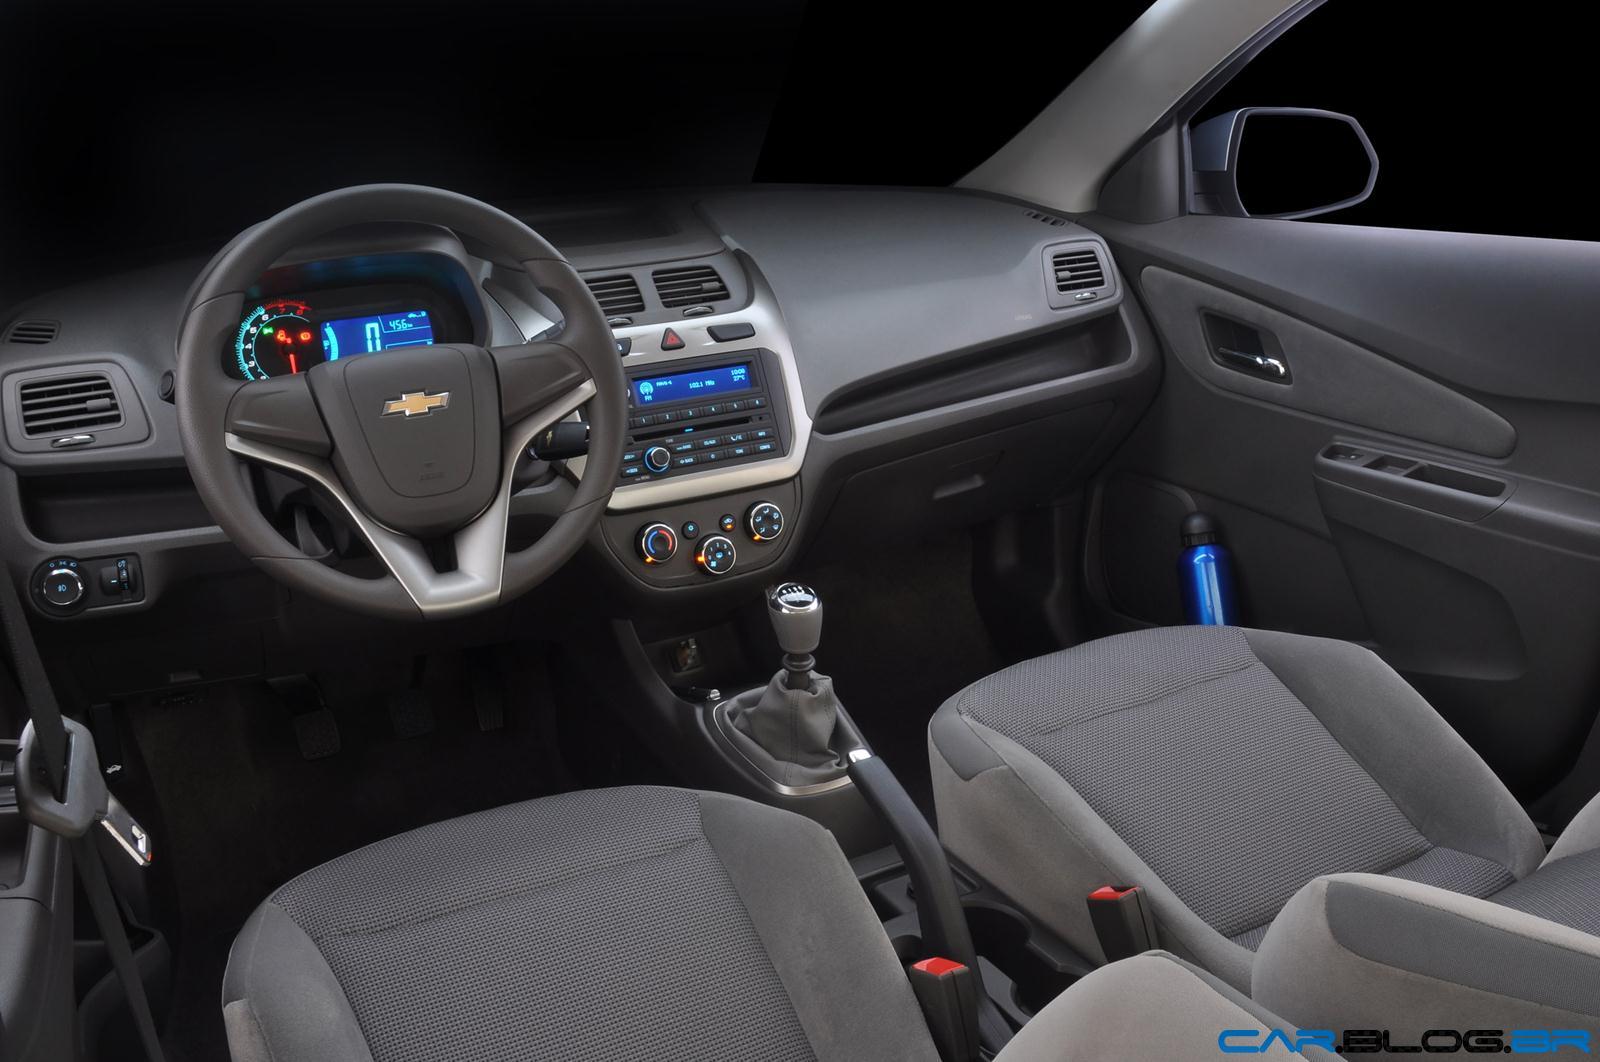 2012 Chevy Cobalt Interior